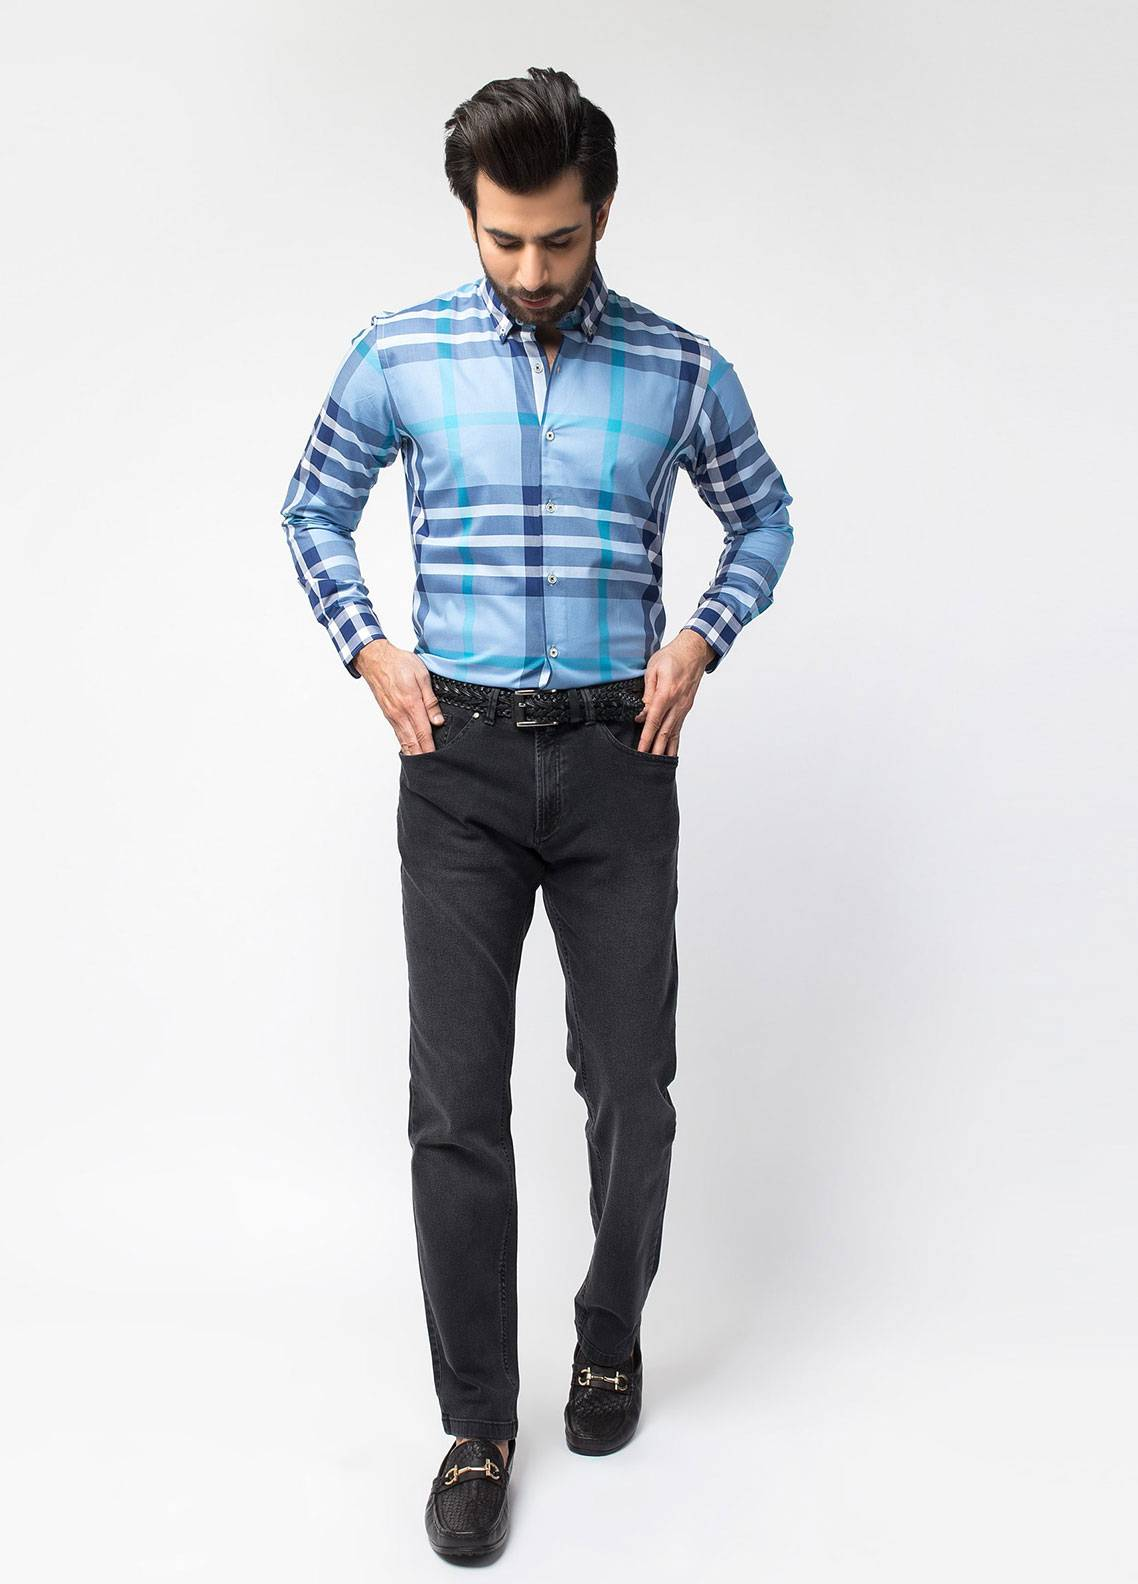 Brumano Cotton Denim Jeans for Men - Blue BRM-401-Light